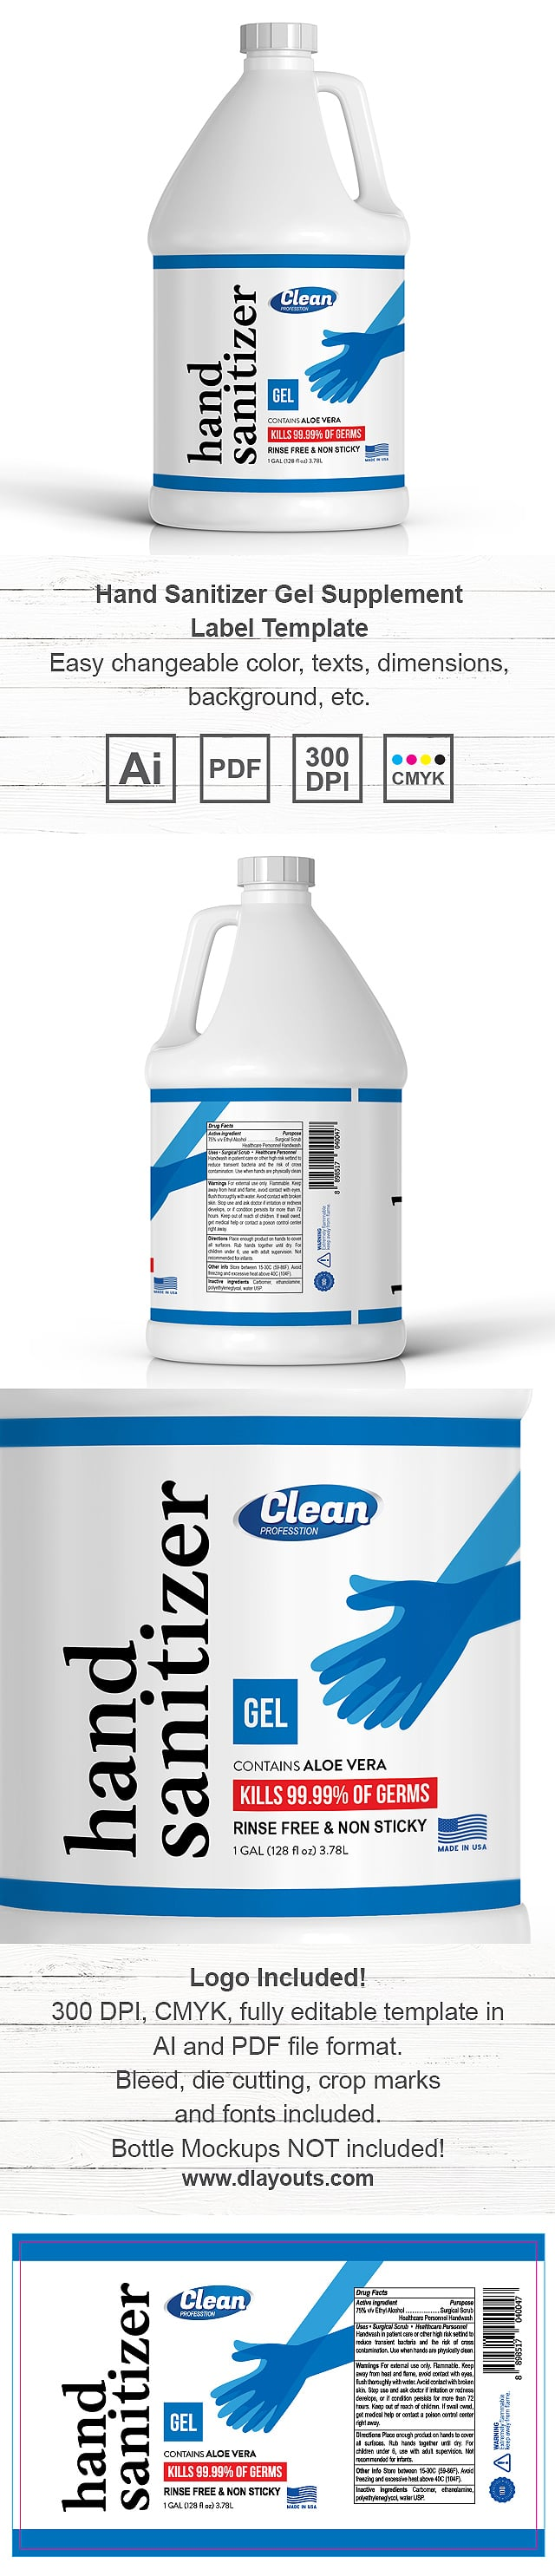 Hand Sanitizer Gel Label Template